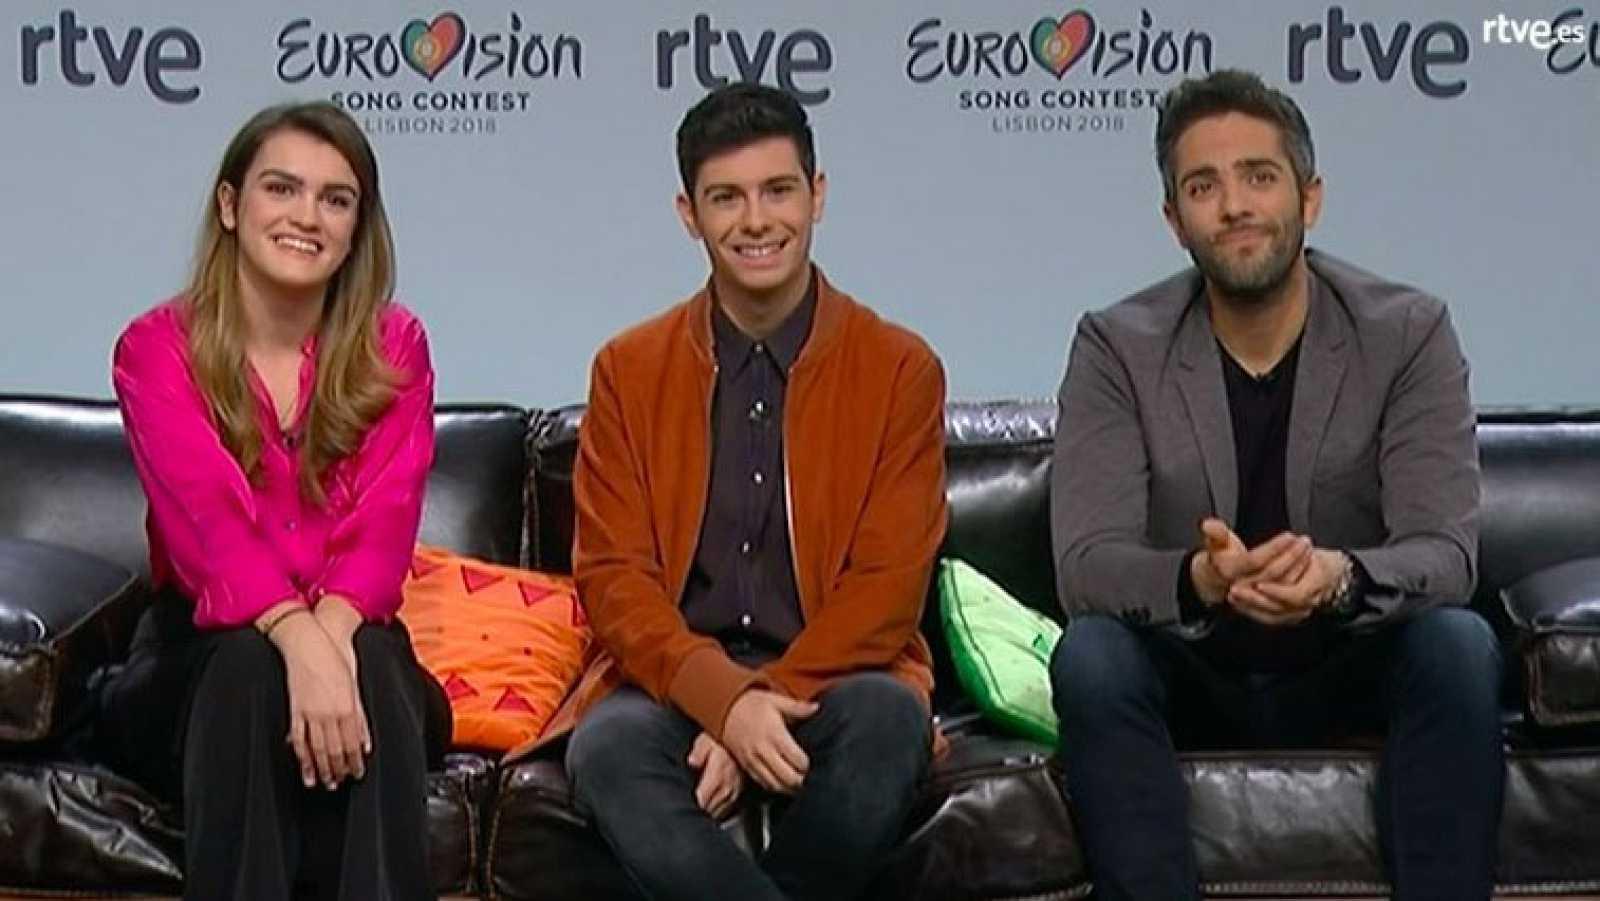 Primera rueda de prensa de Alfred y Amaia como representantes de España para Eurovisión